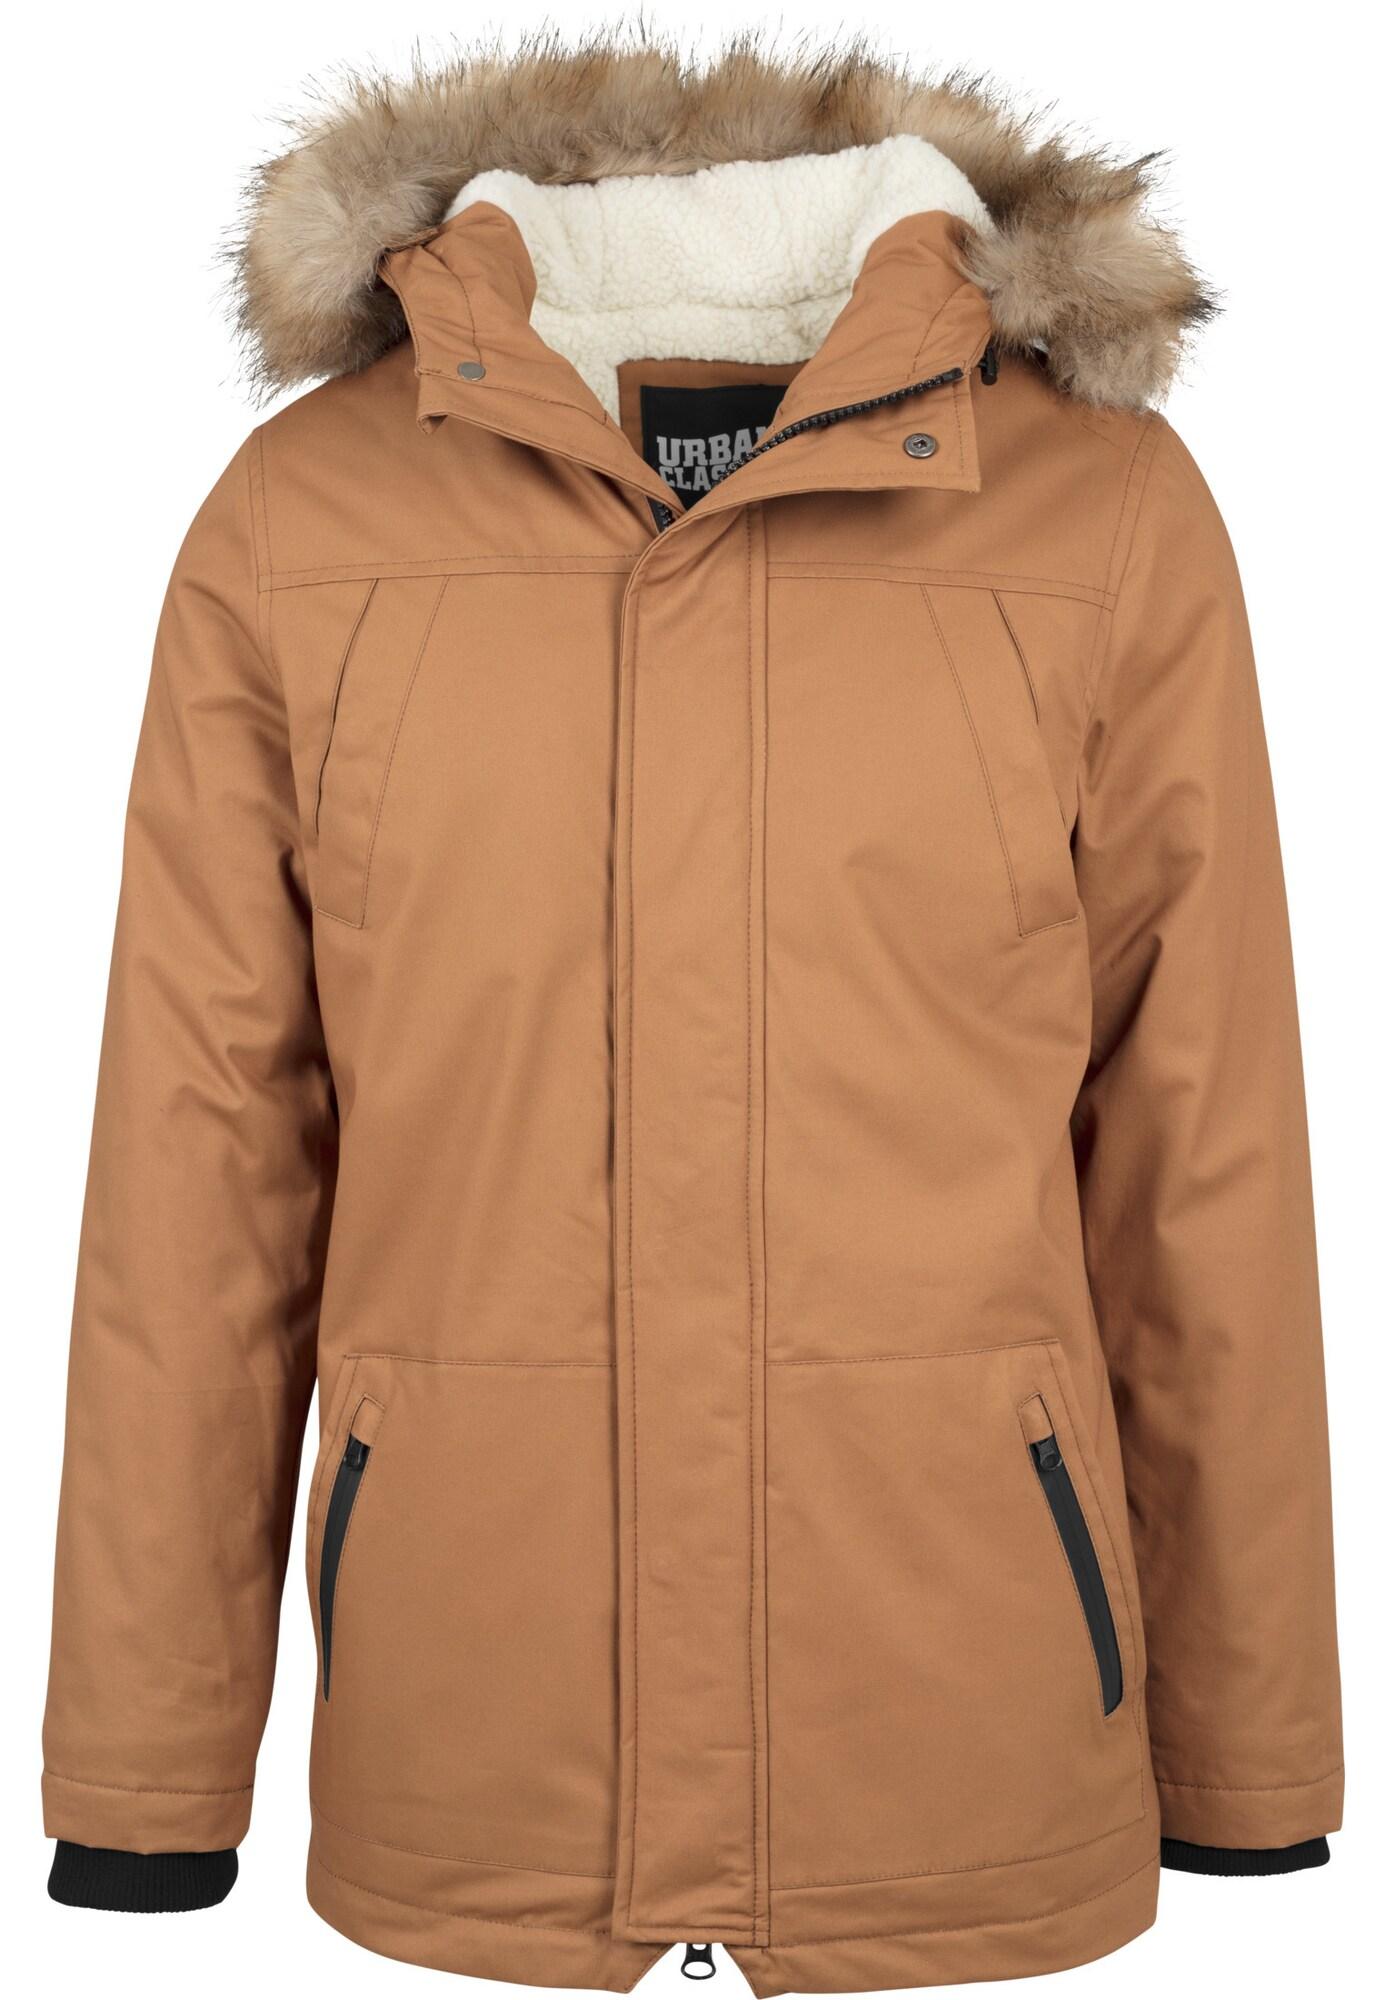 Winterparka 'Heavy Cotton Imitation Fur'   Bekleidung > Jacken > Parkas   Urban Classics